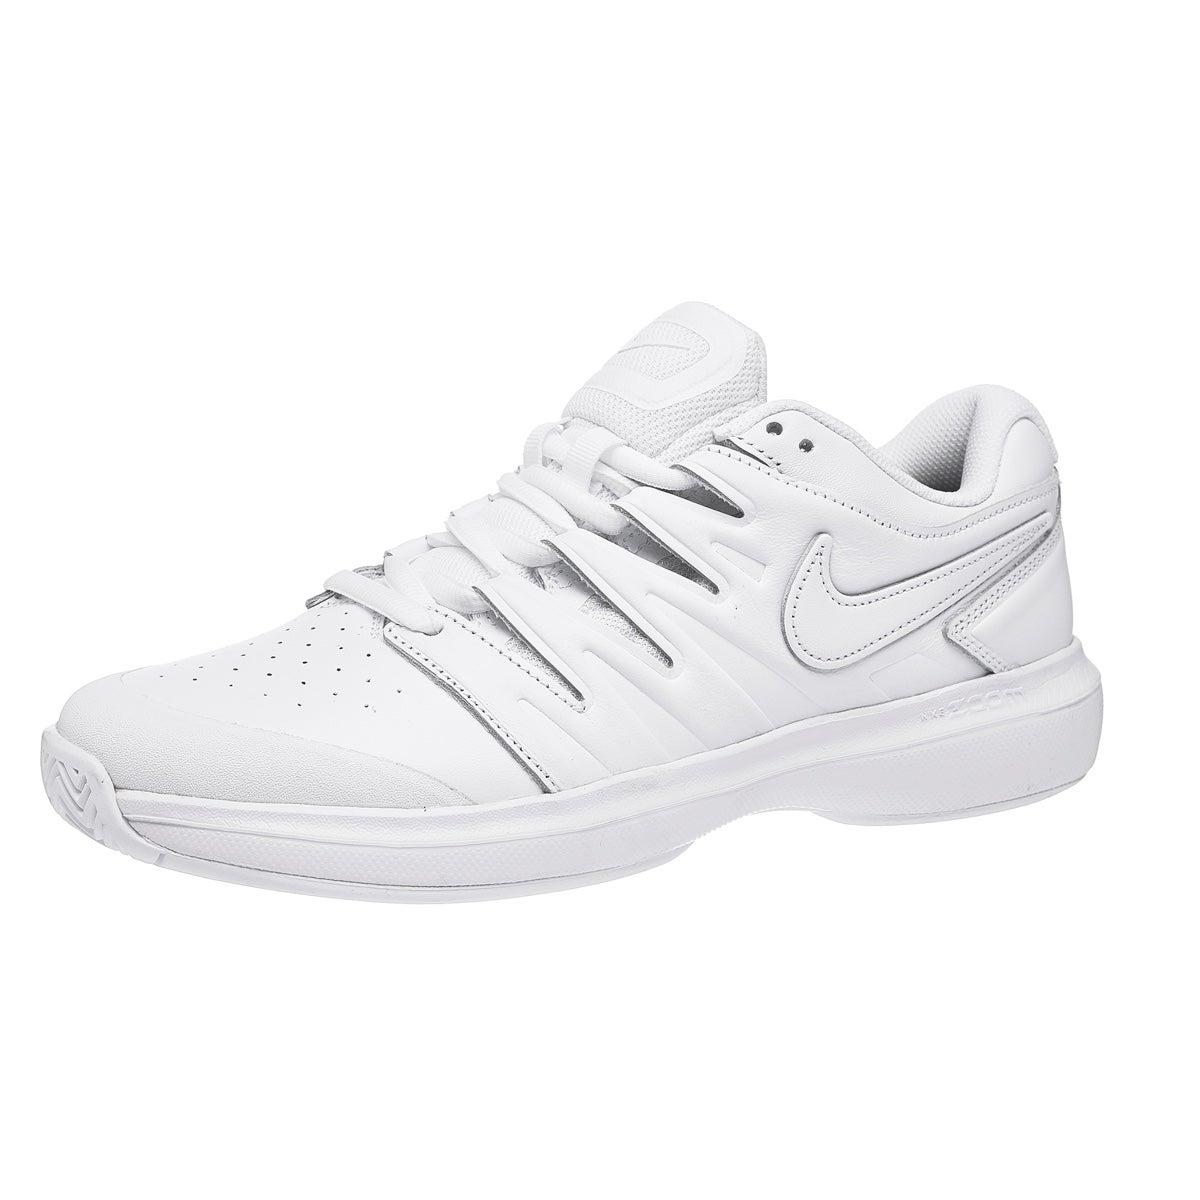 8cc9516e6ec2 Nike Air Zoom Prestige Leather White Black Men s Shoe 360° View